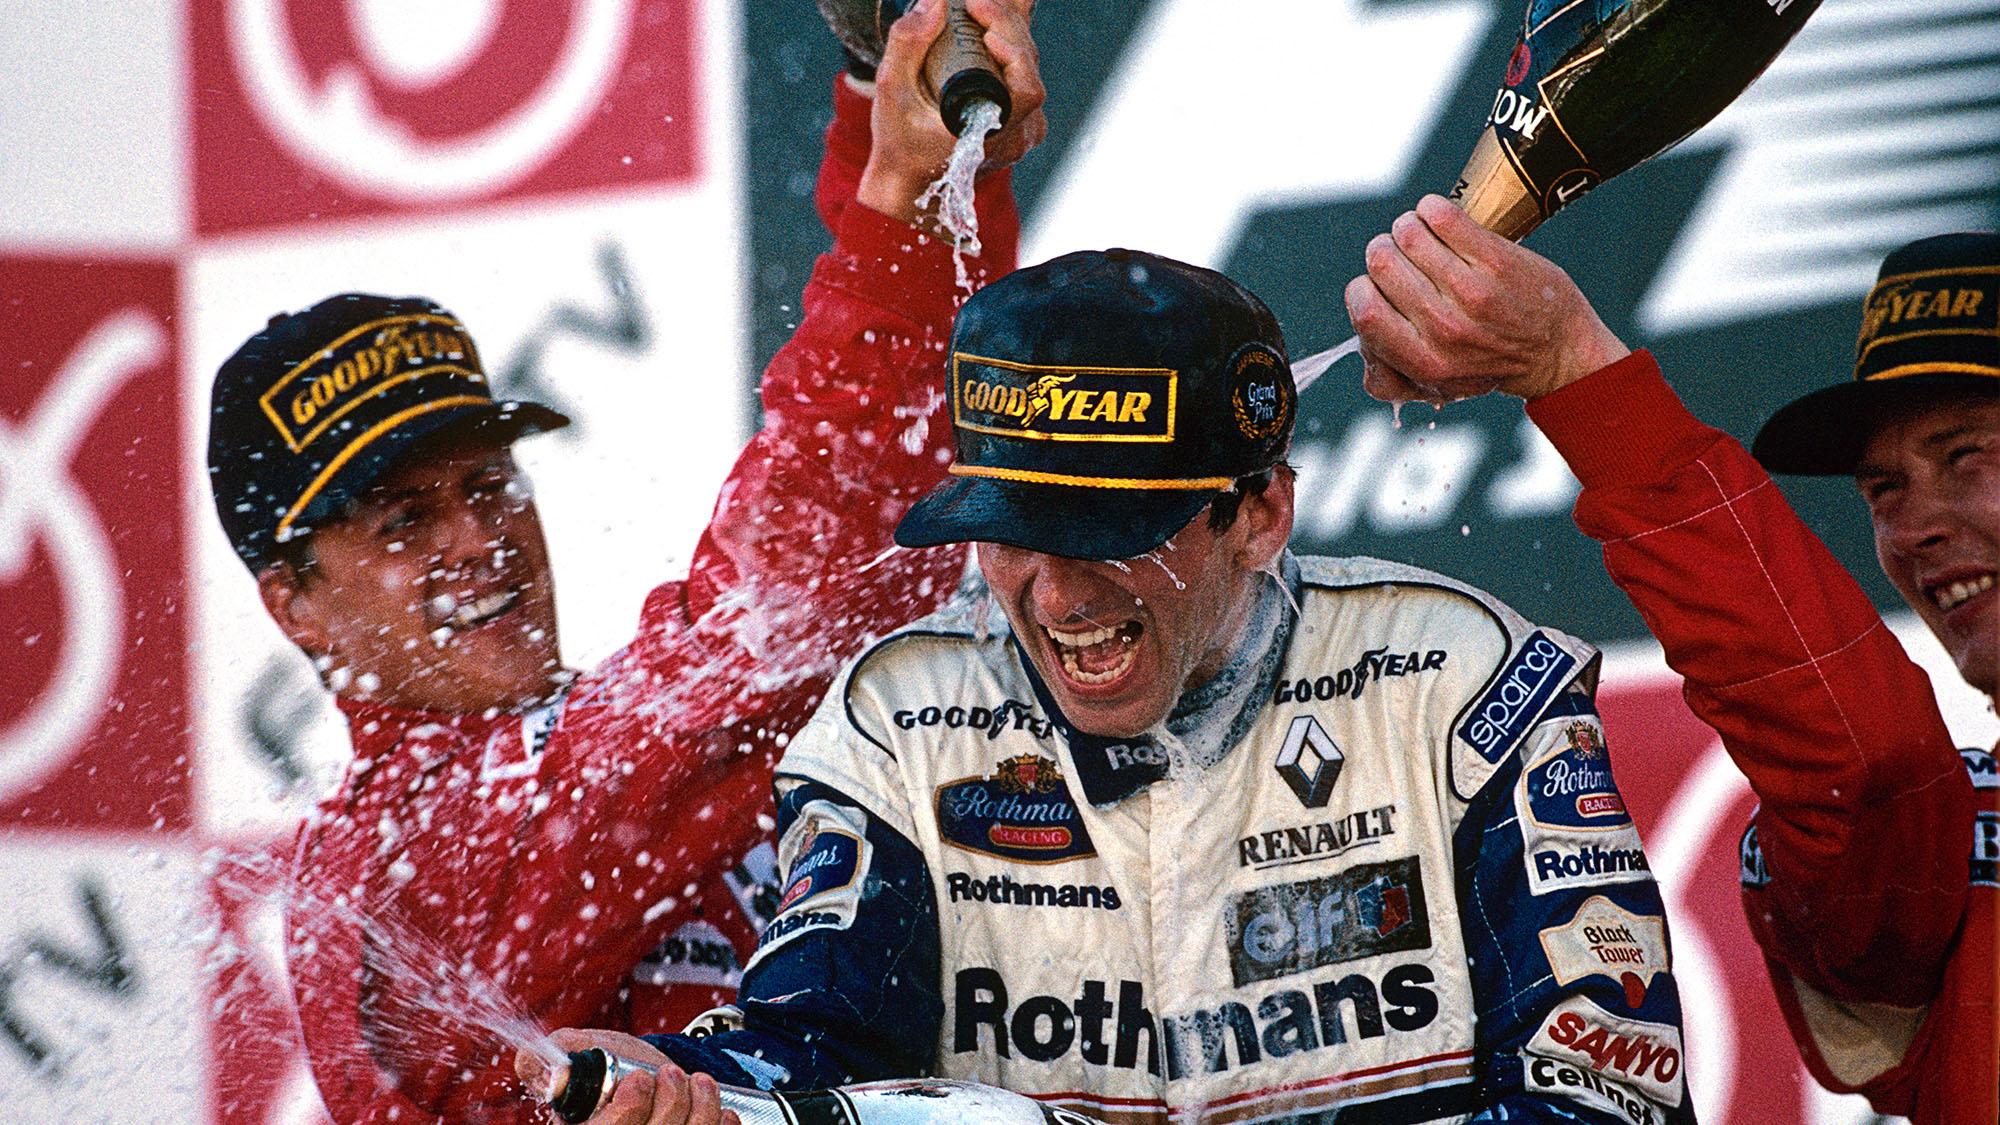 Damon Hill sprayed with champagne on the Suzuka podium in 1996